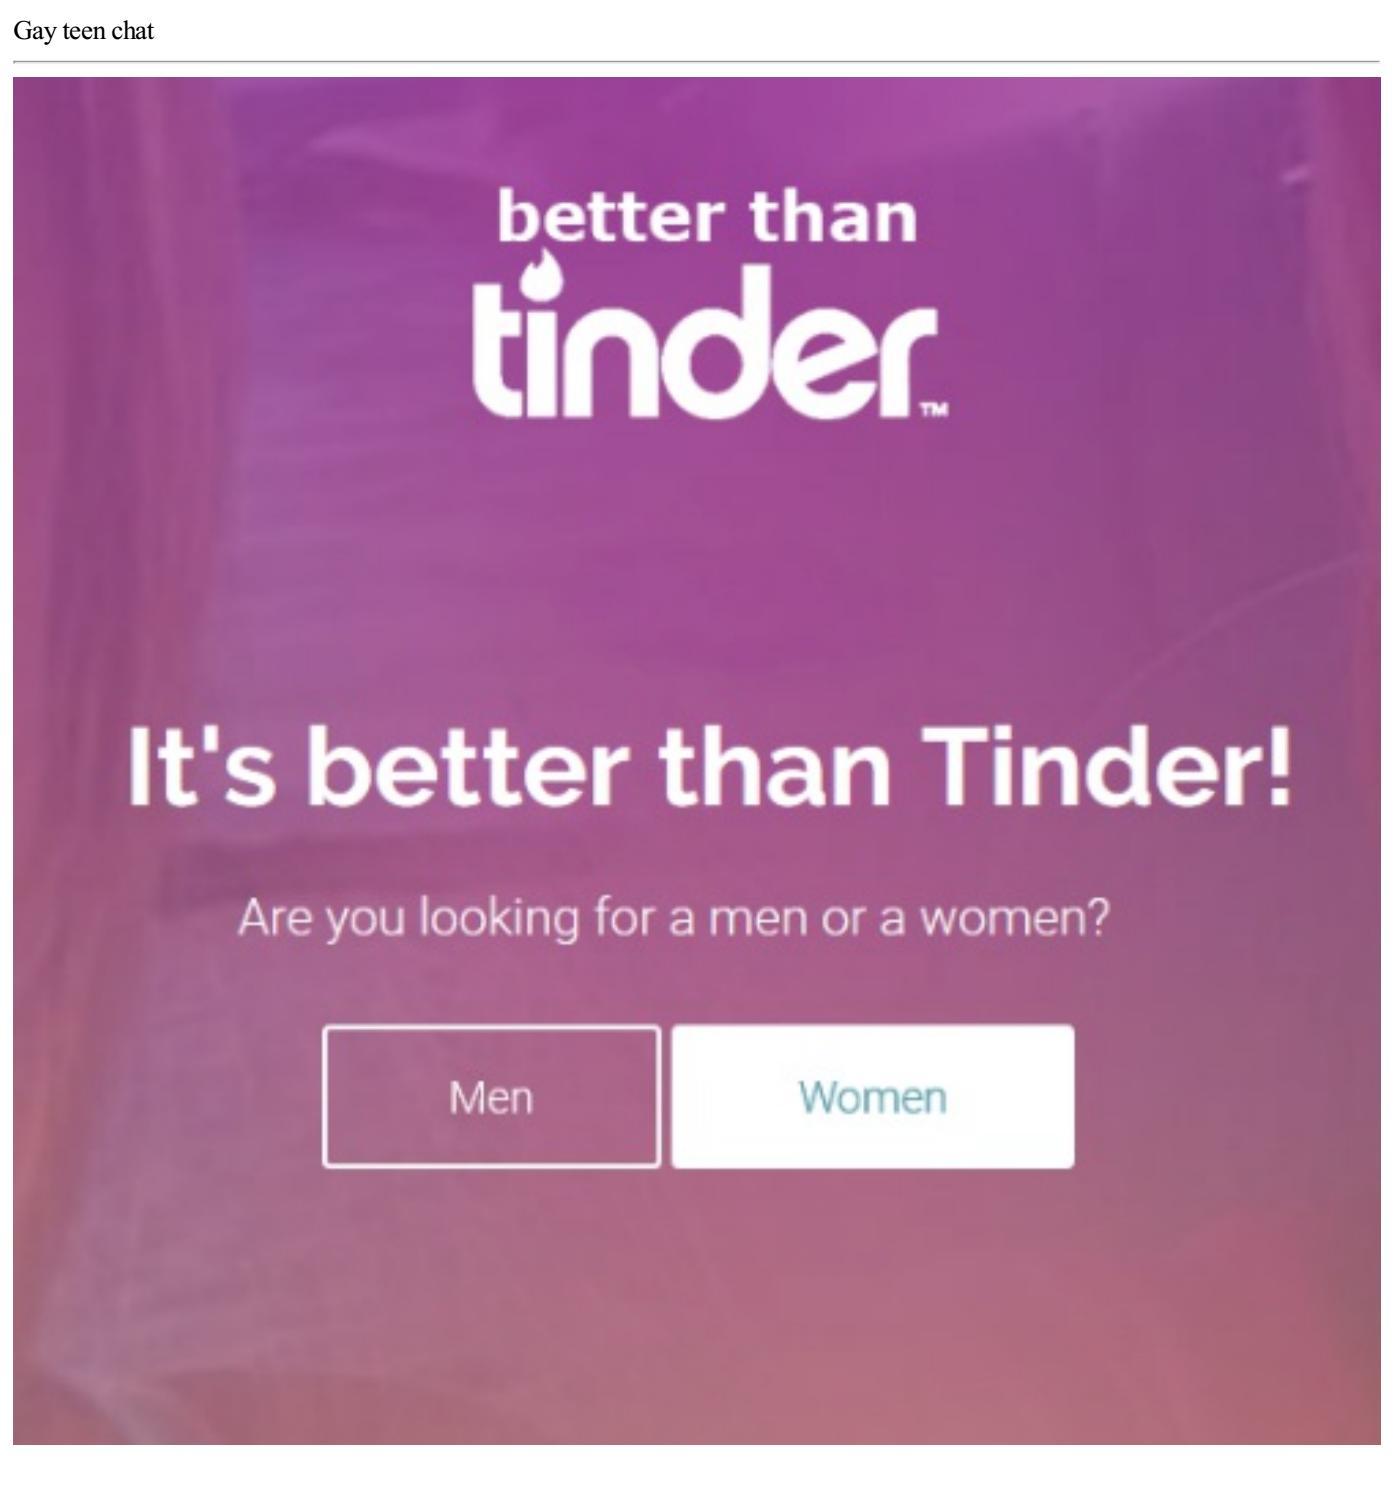 Tinder dating statistics